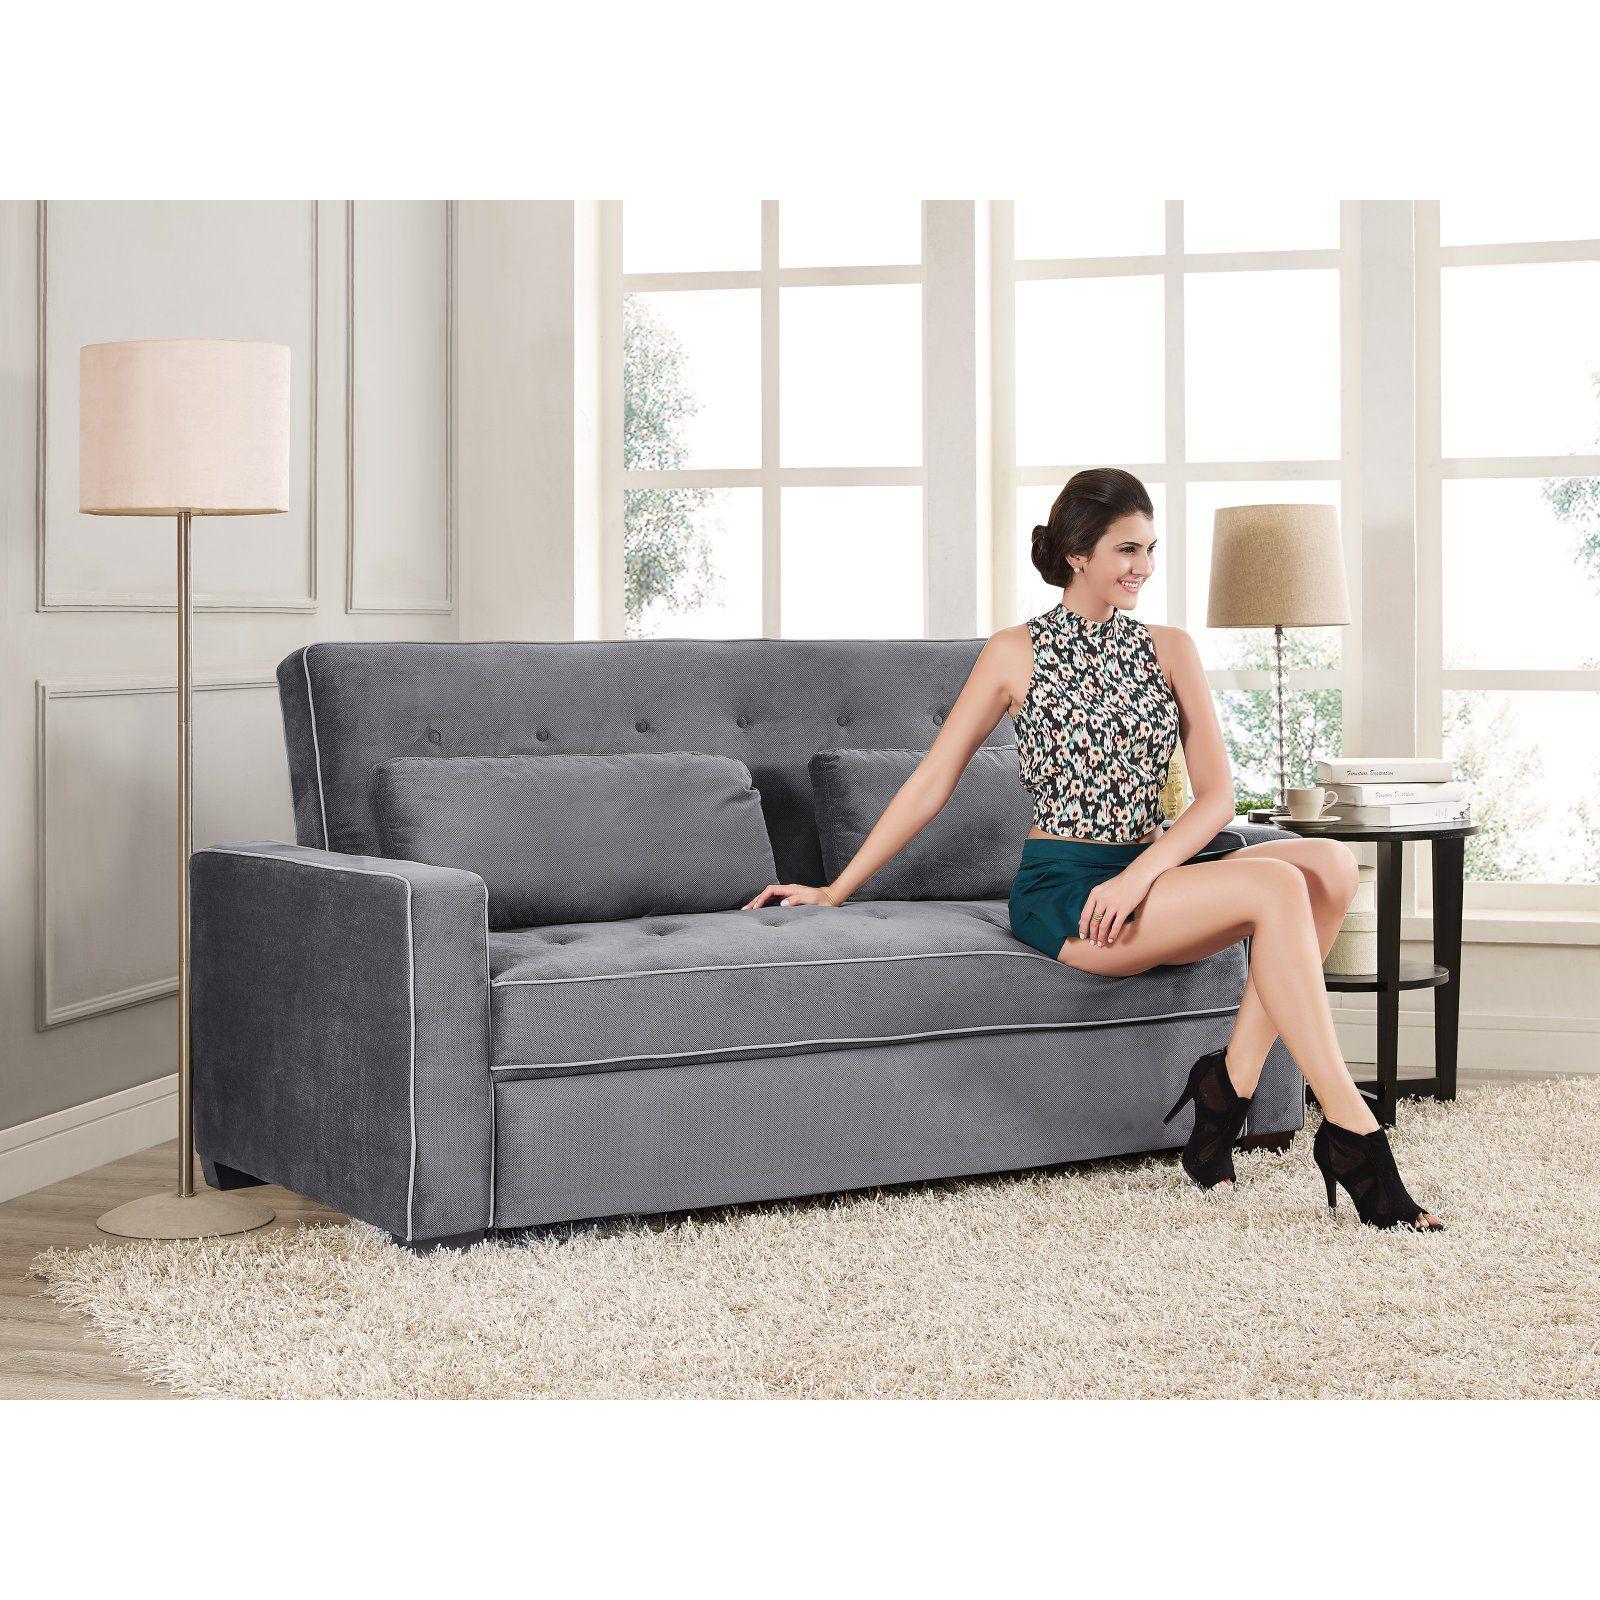 Home In 2020 Sofa Futon Sofa Bed Futon Sofa